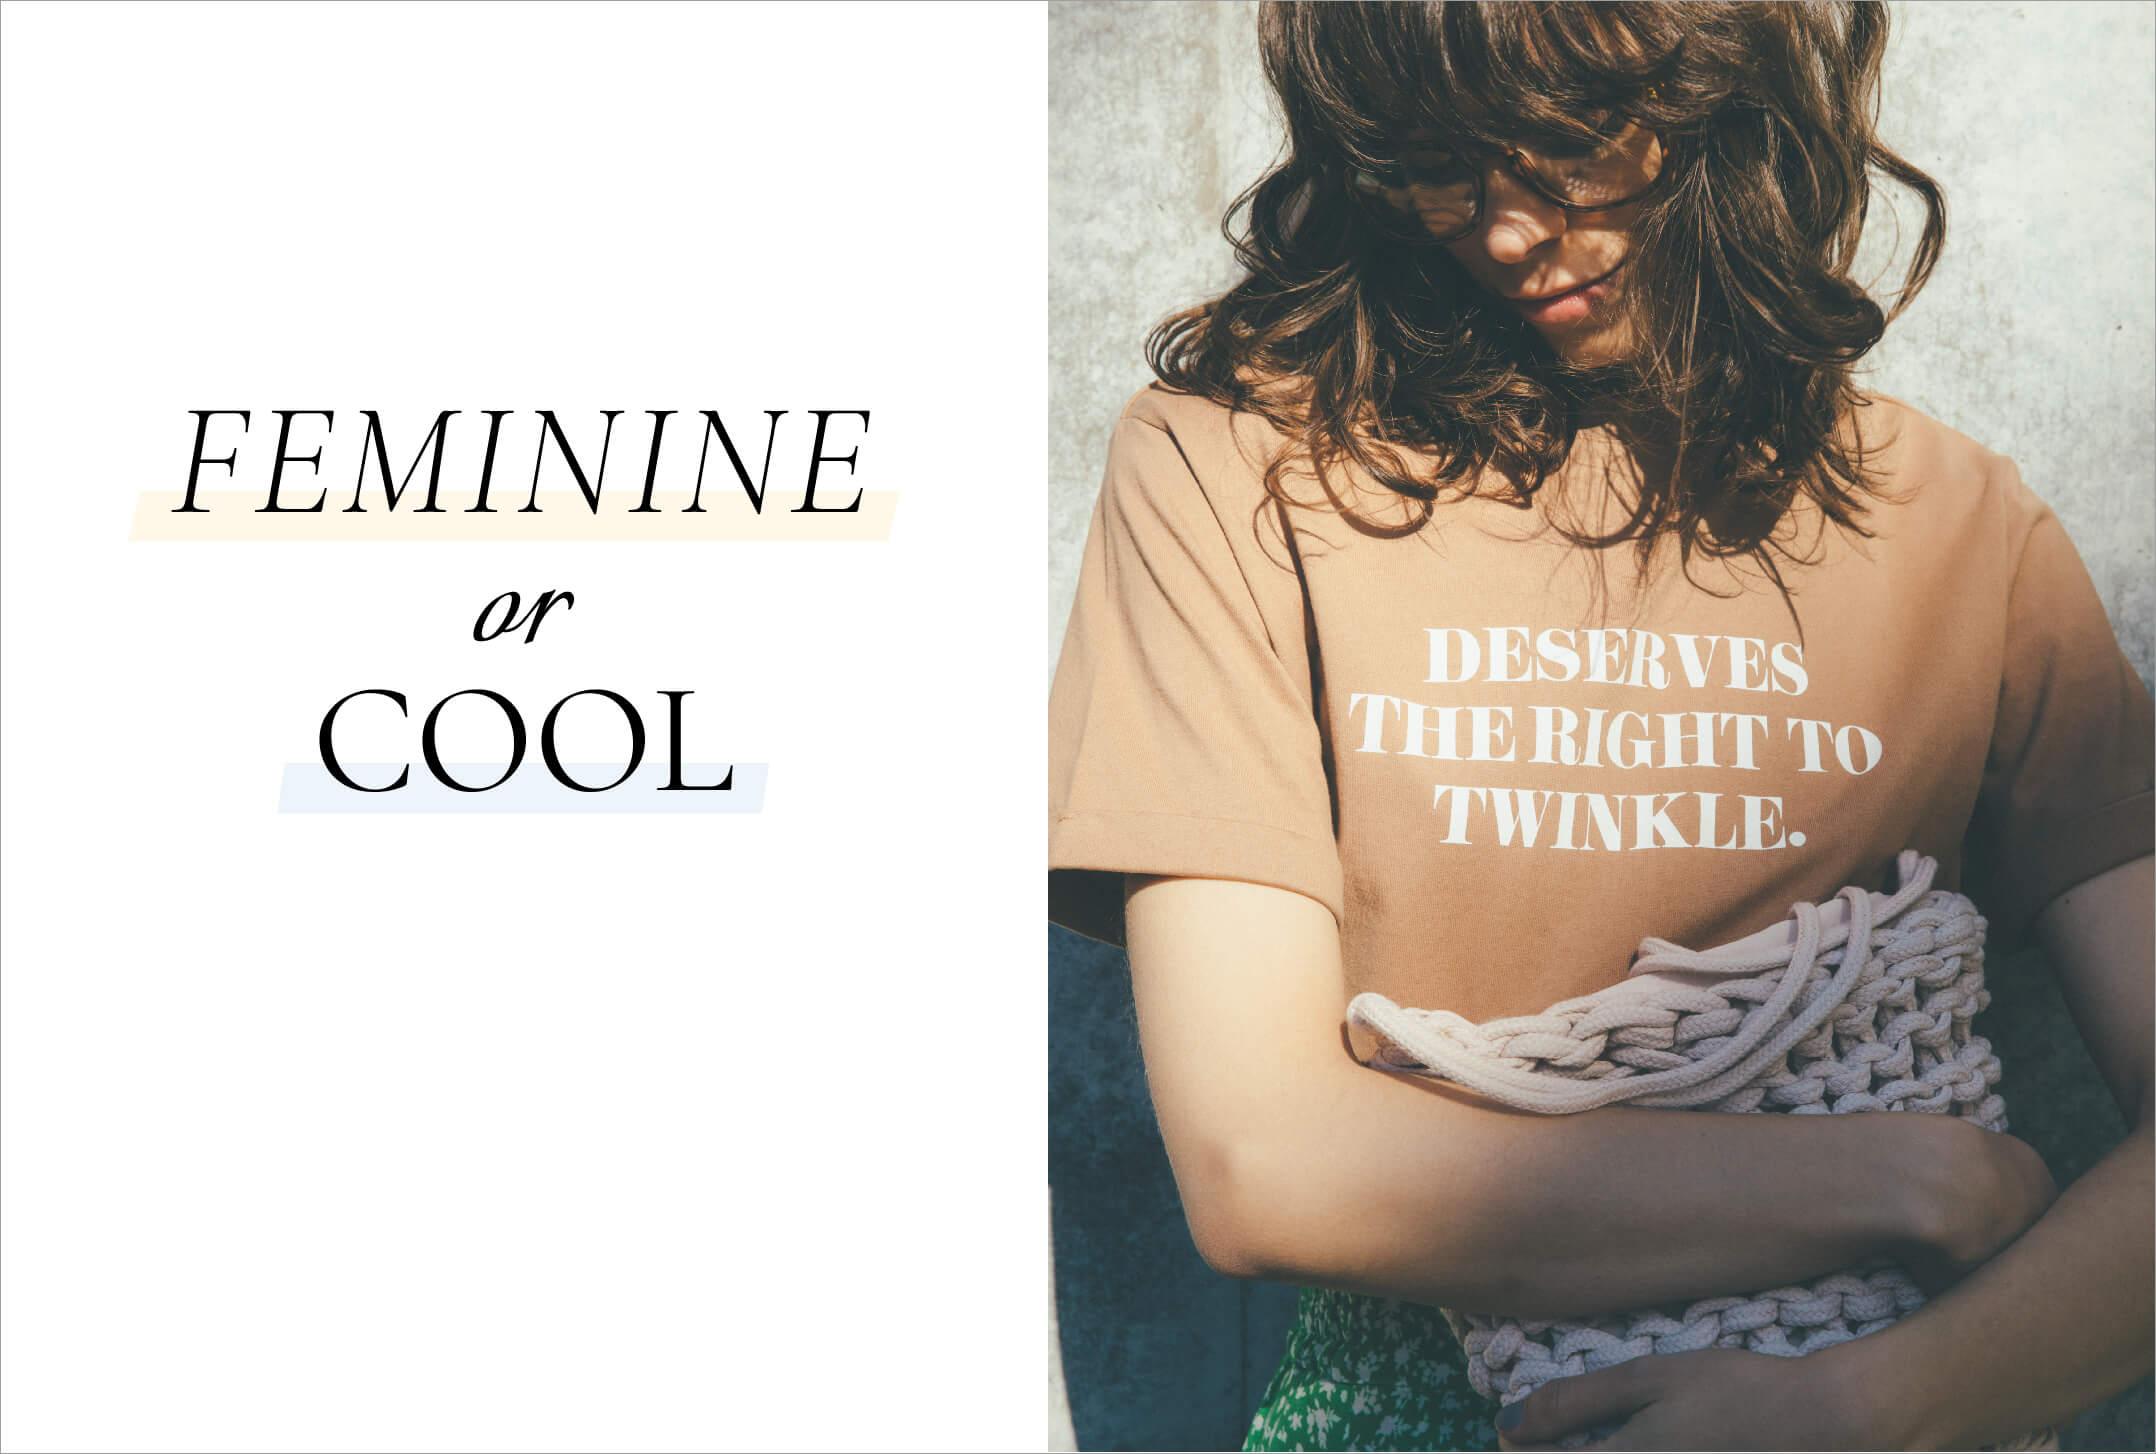 FEMININE or COOL